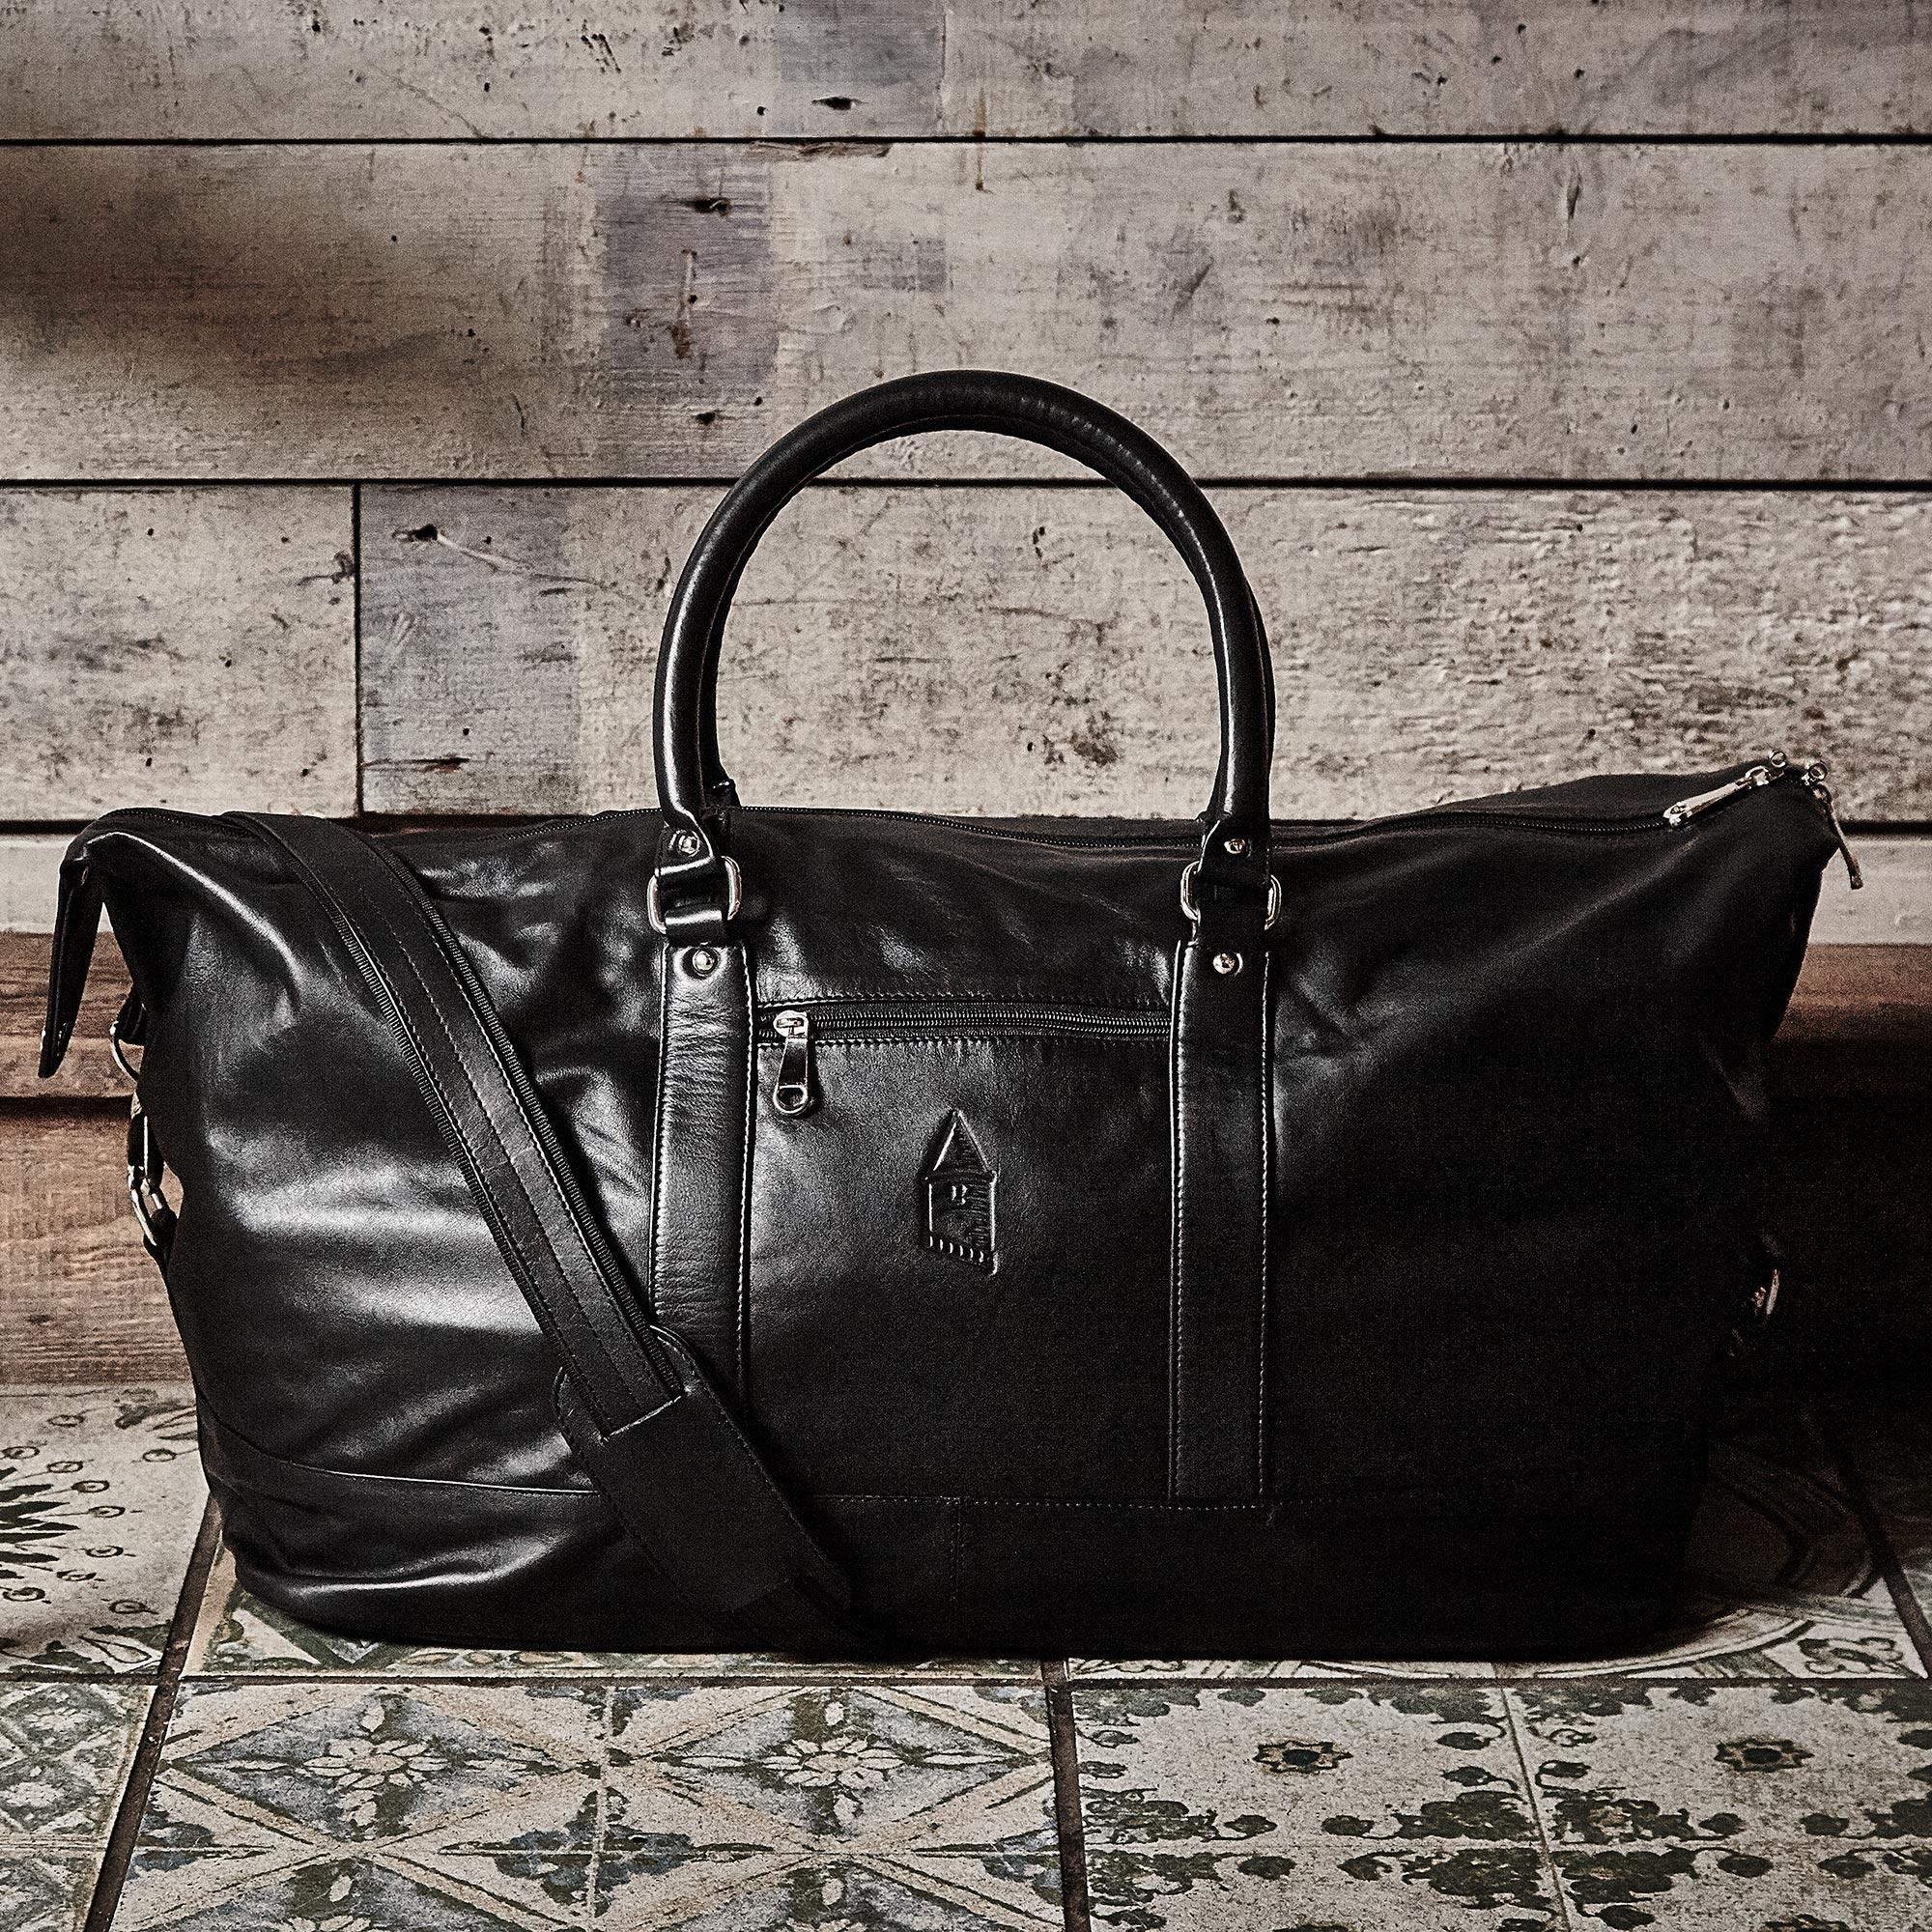 Everton 1878 Nappa Leather Travel Bag